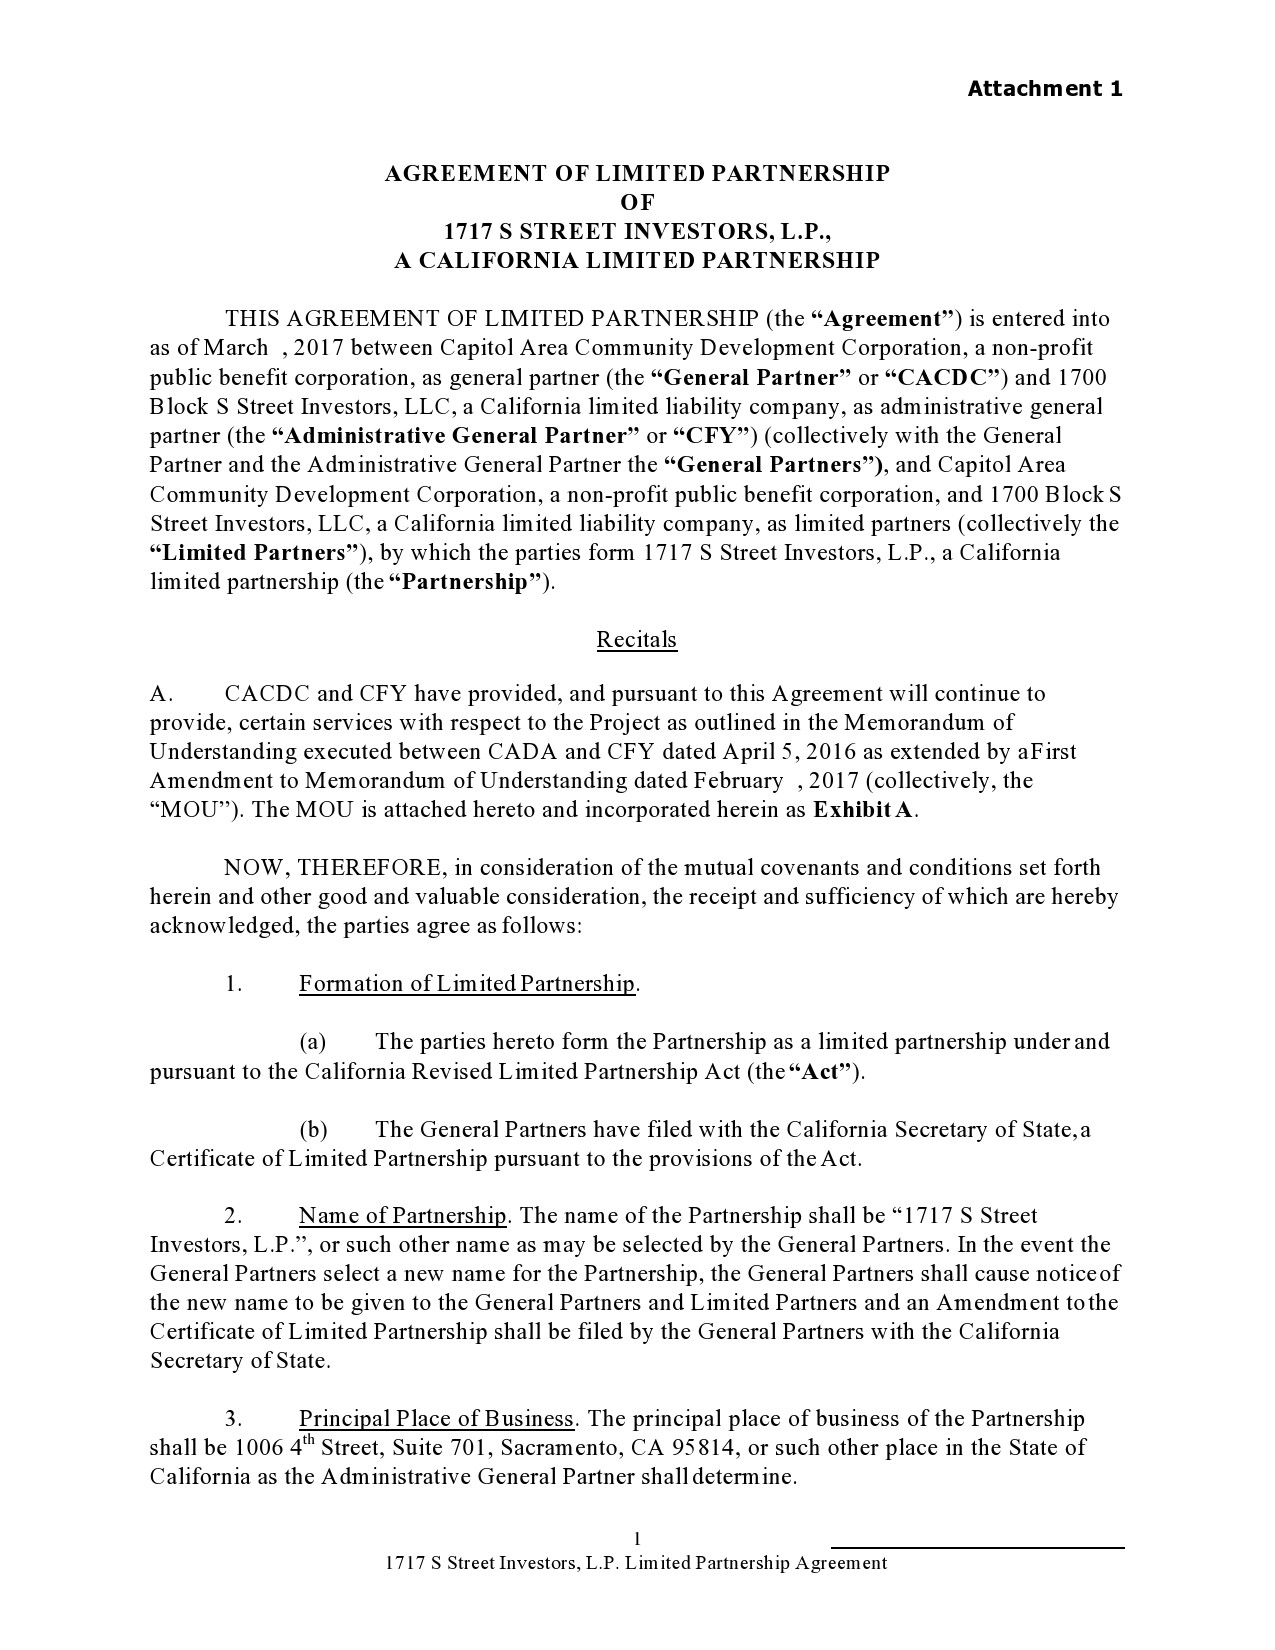 Free limited partnership agreement 32